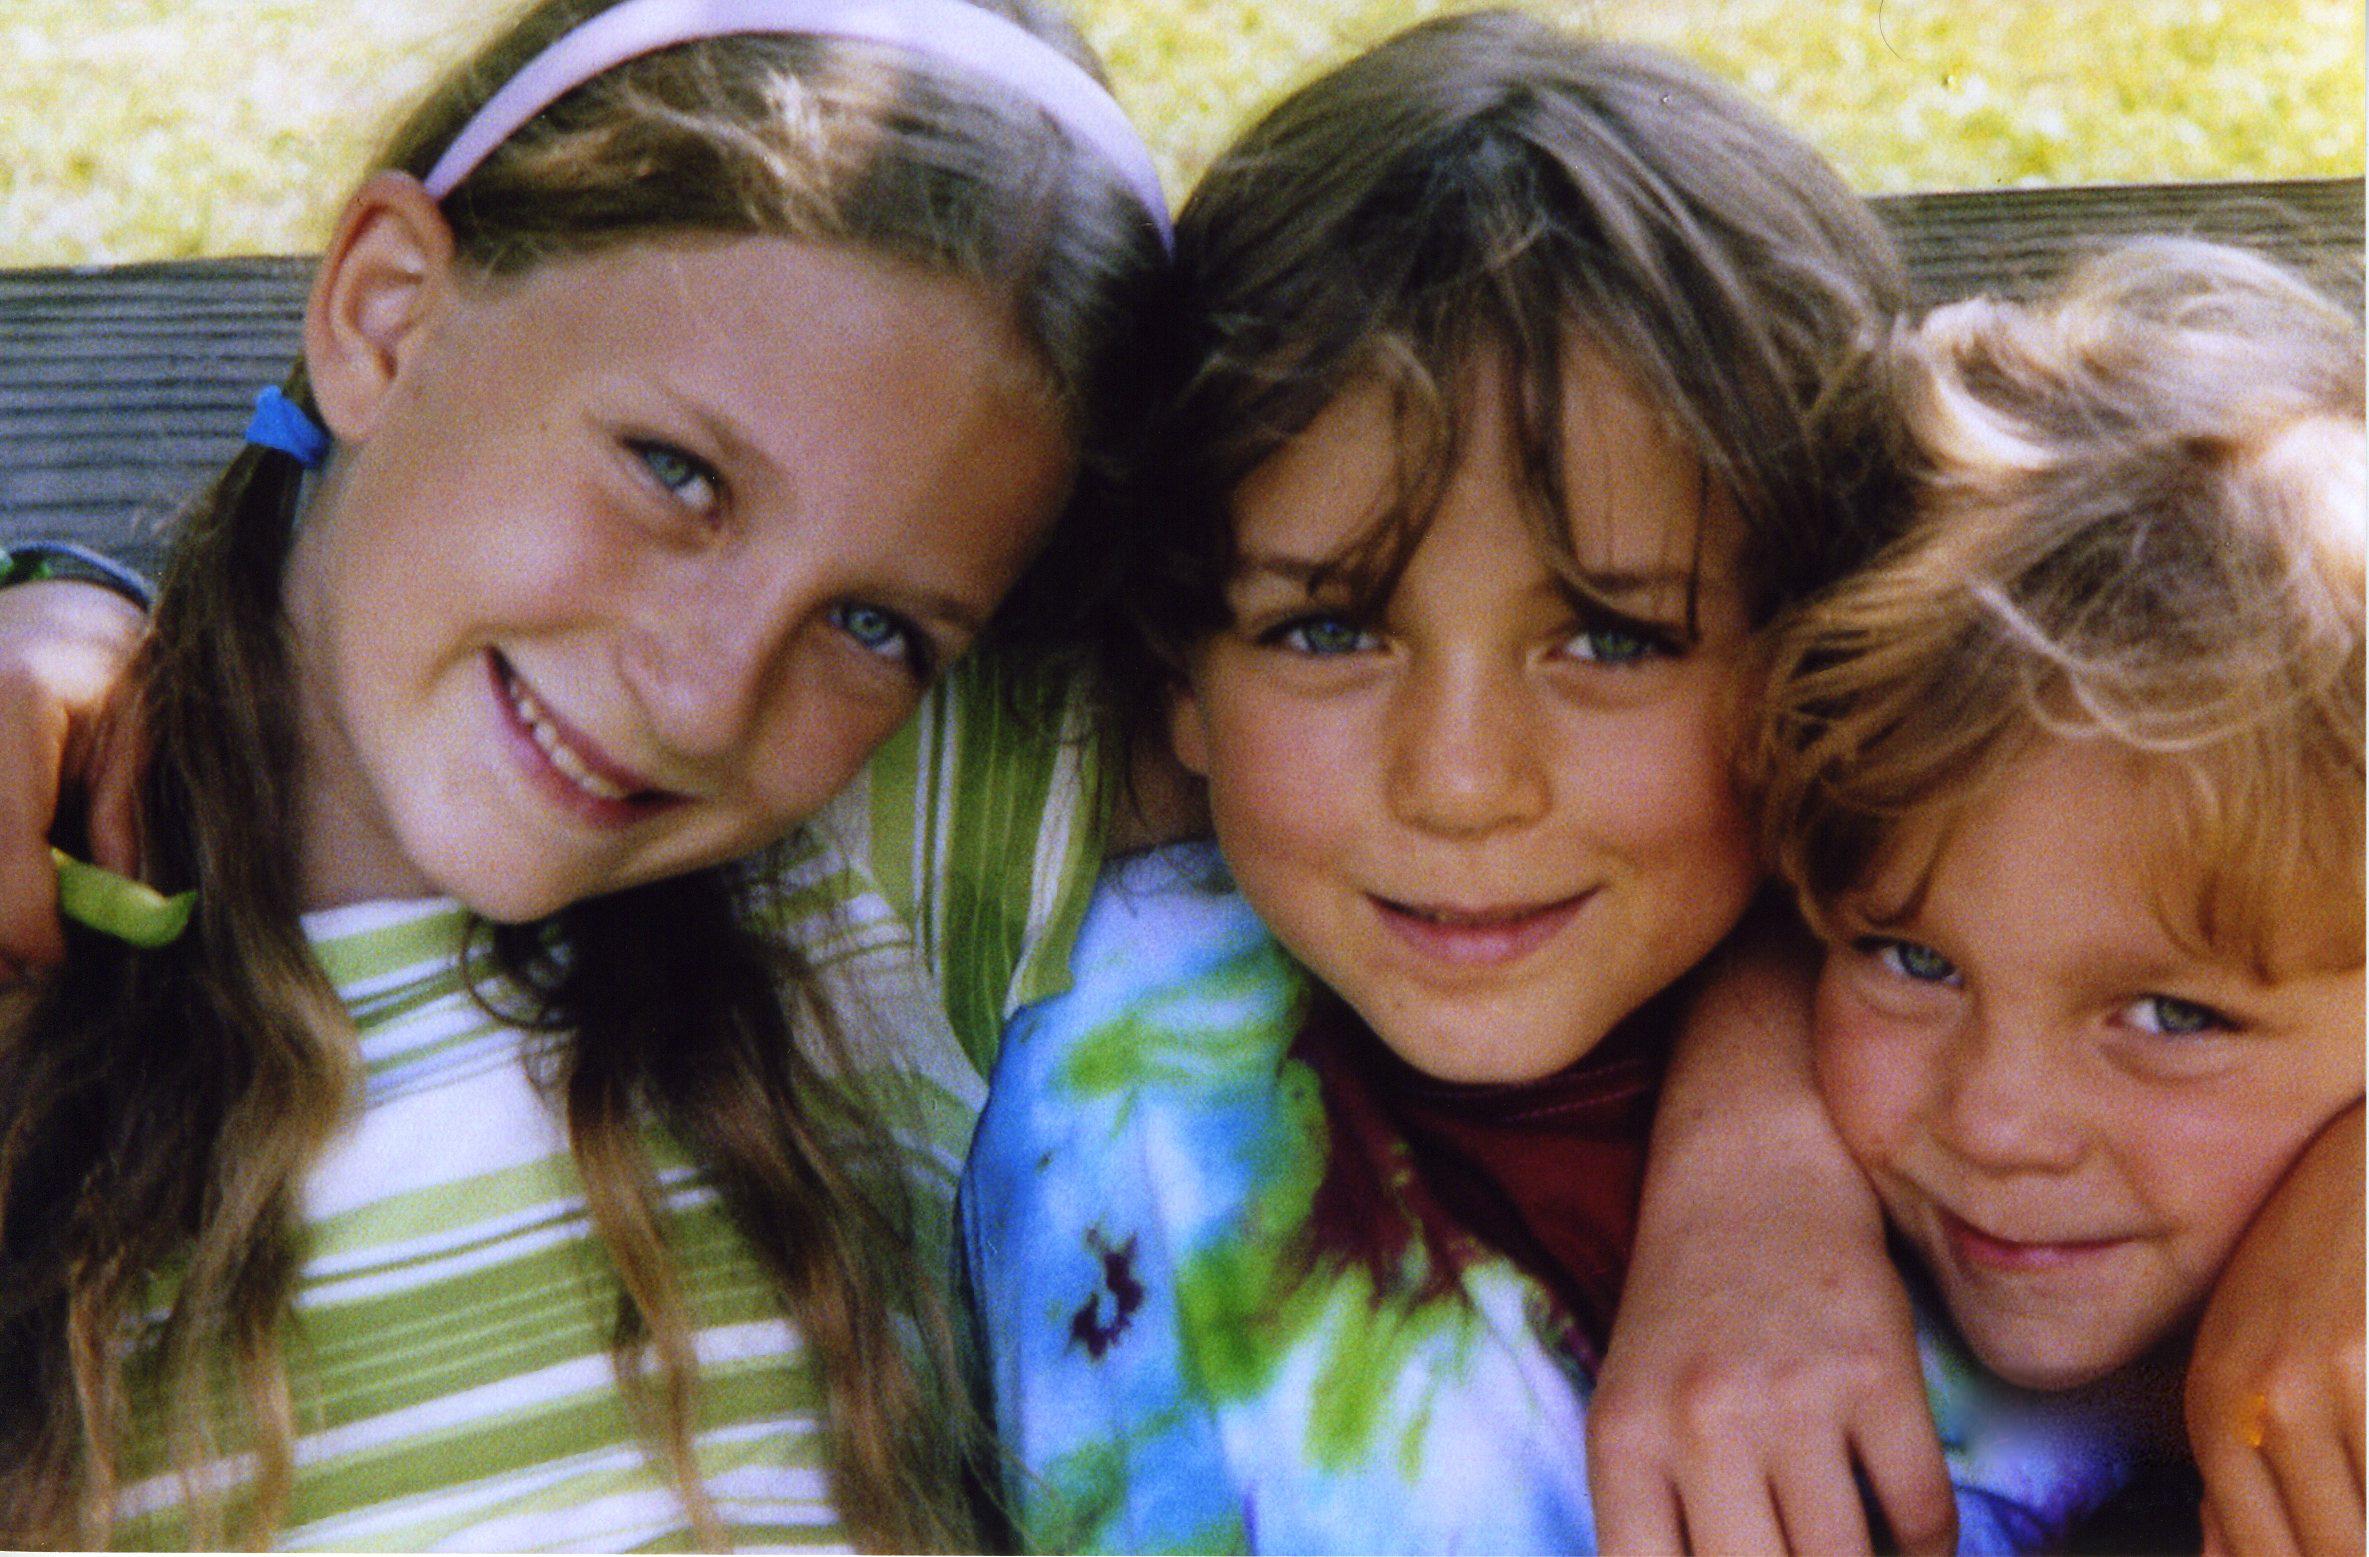 Three of my precious children: Angelina, Noah and Sylvan.